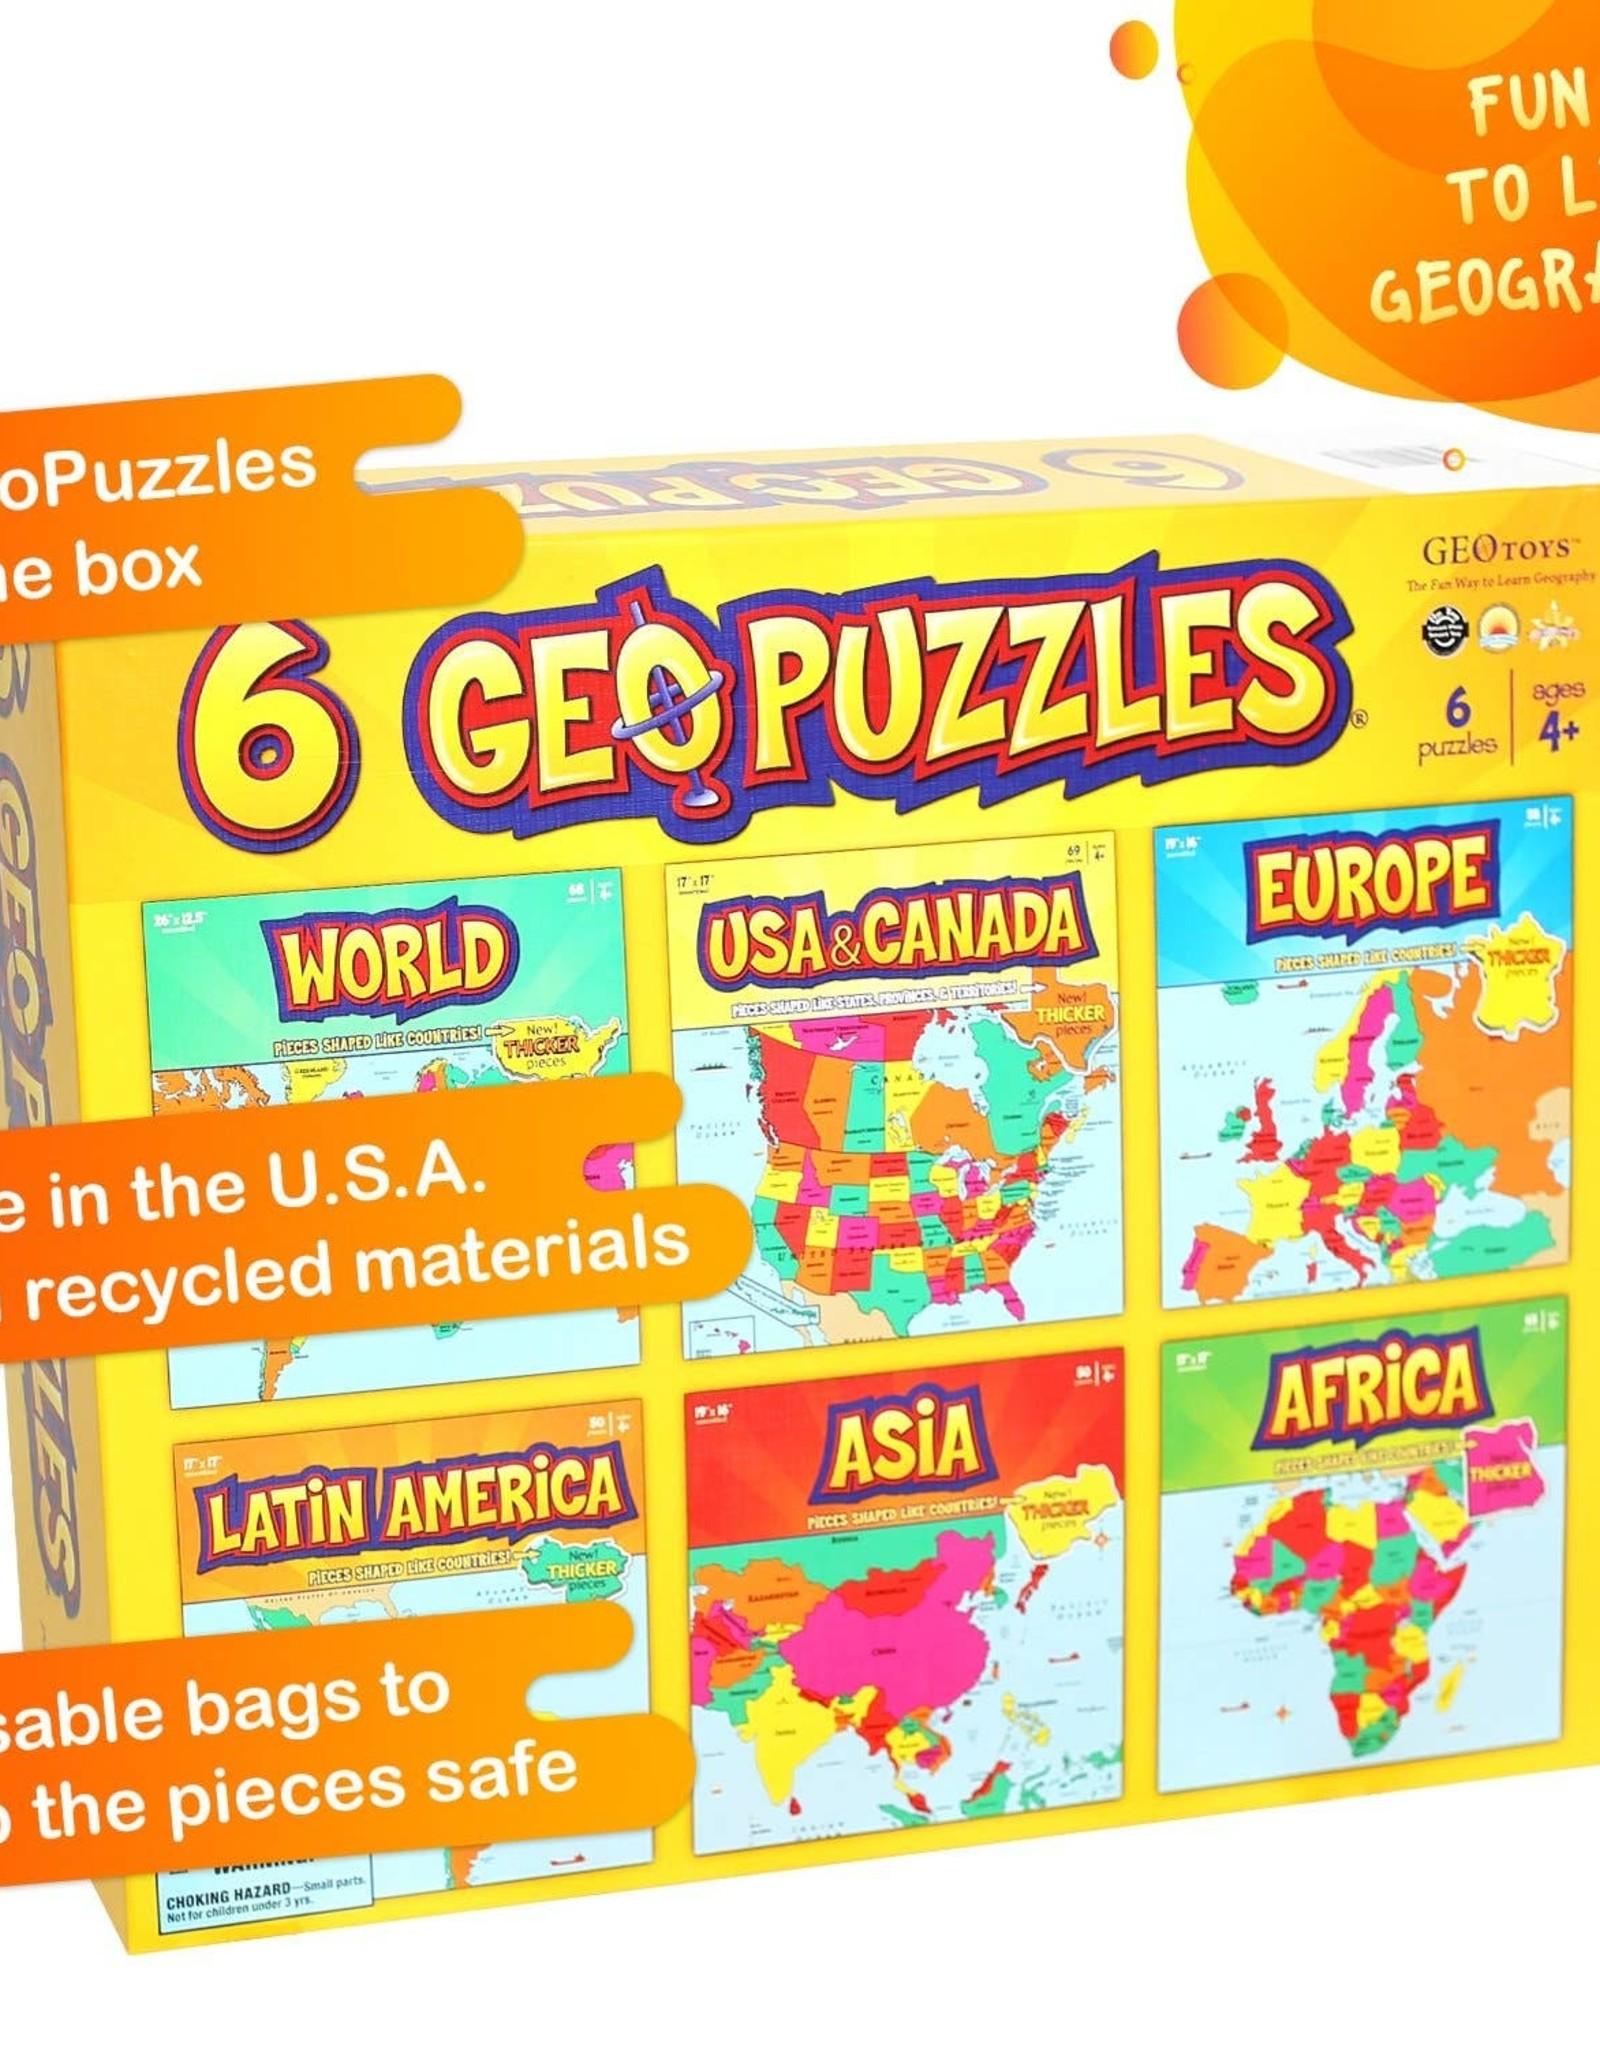 Geotoys 6 GeoPuzzles - One Box